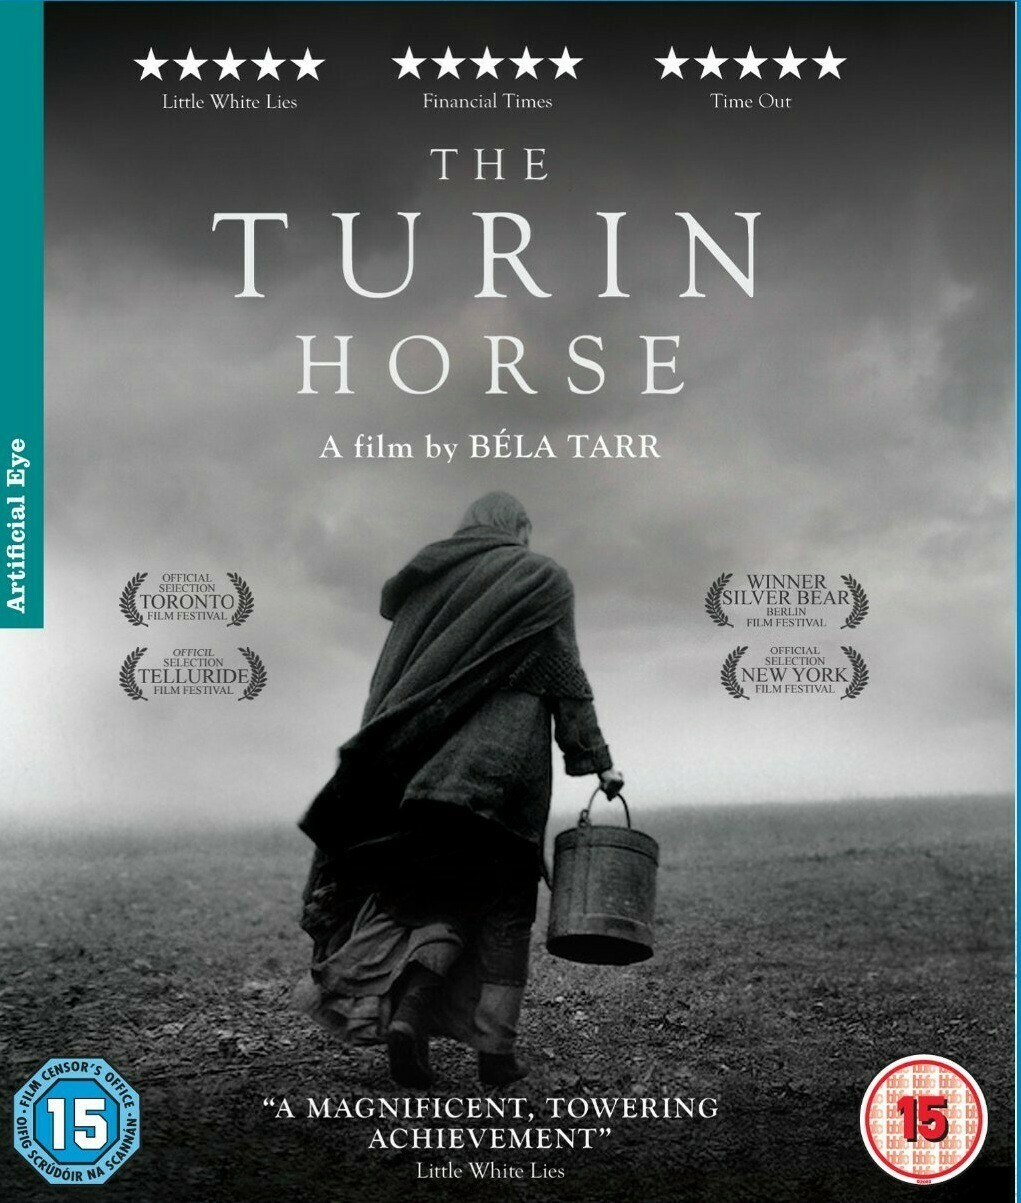 THE TURIN HORSE - BLURAY